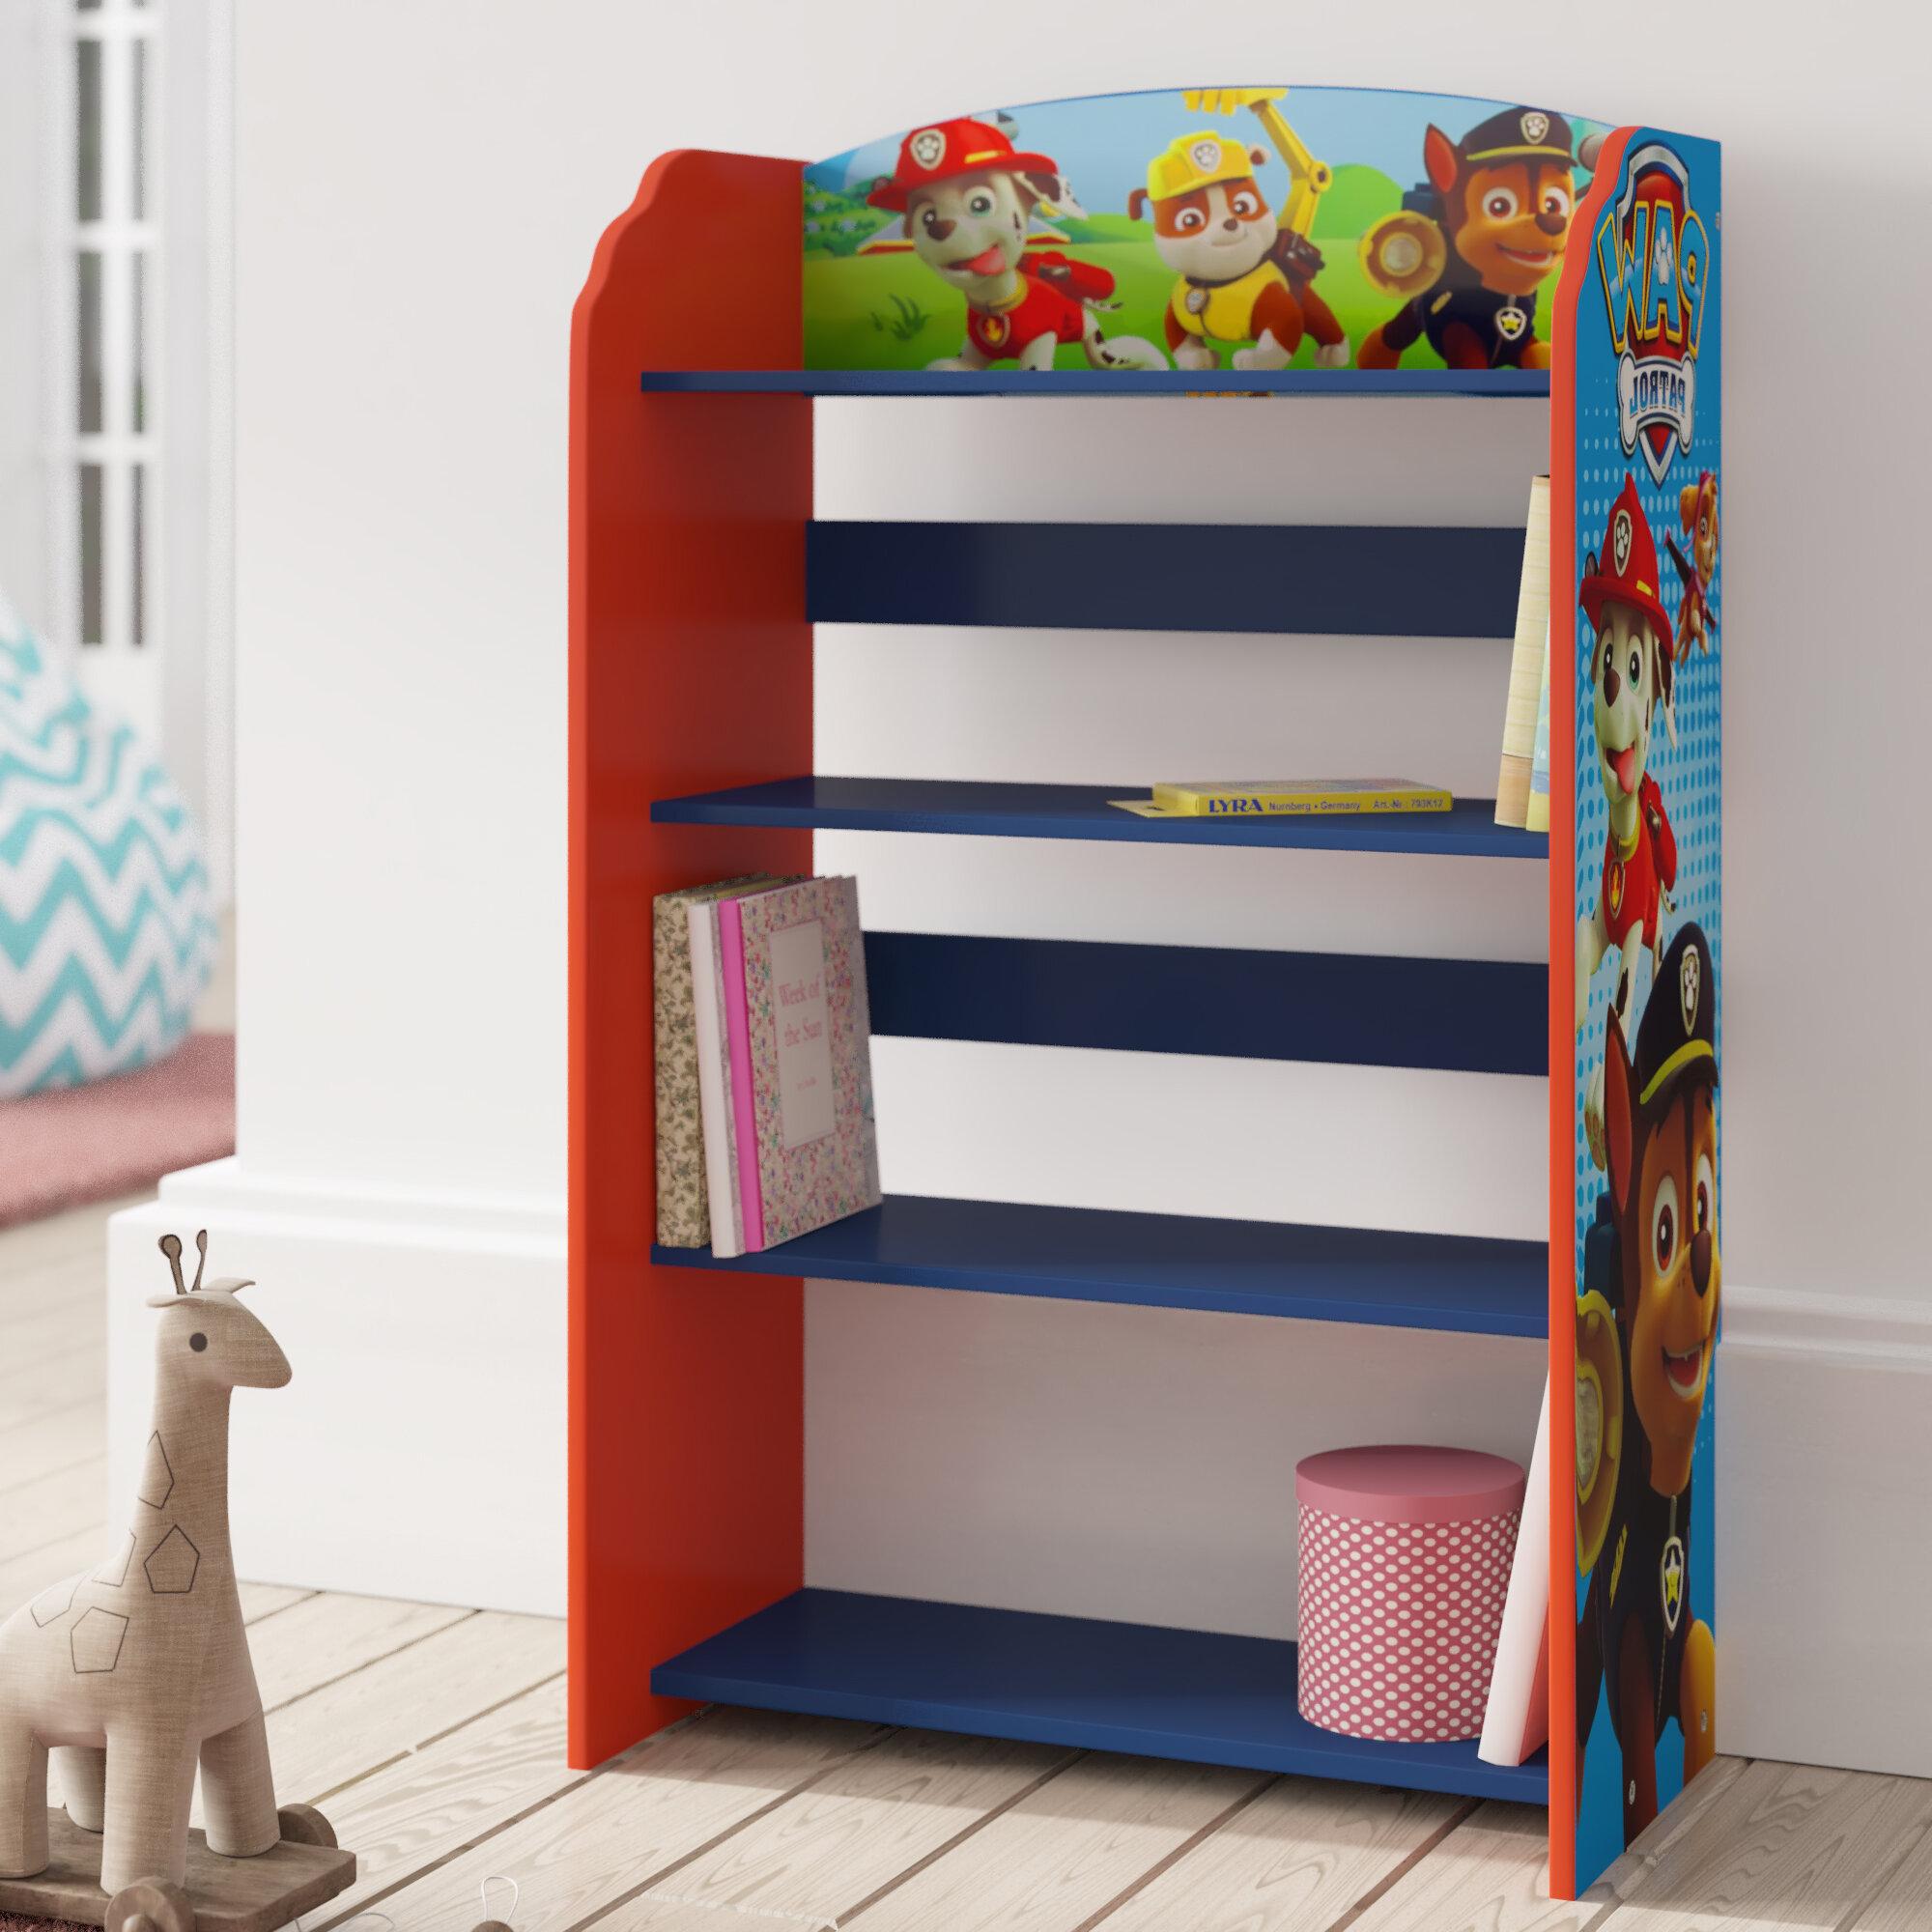 Paw Patrol Children S Bookcase Reviews Wayfair Co Uk